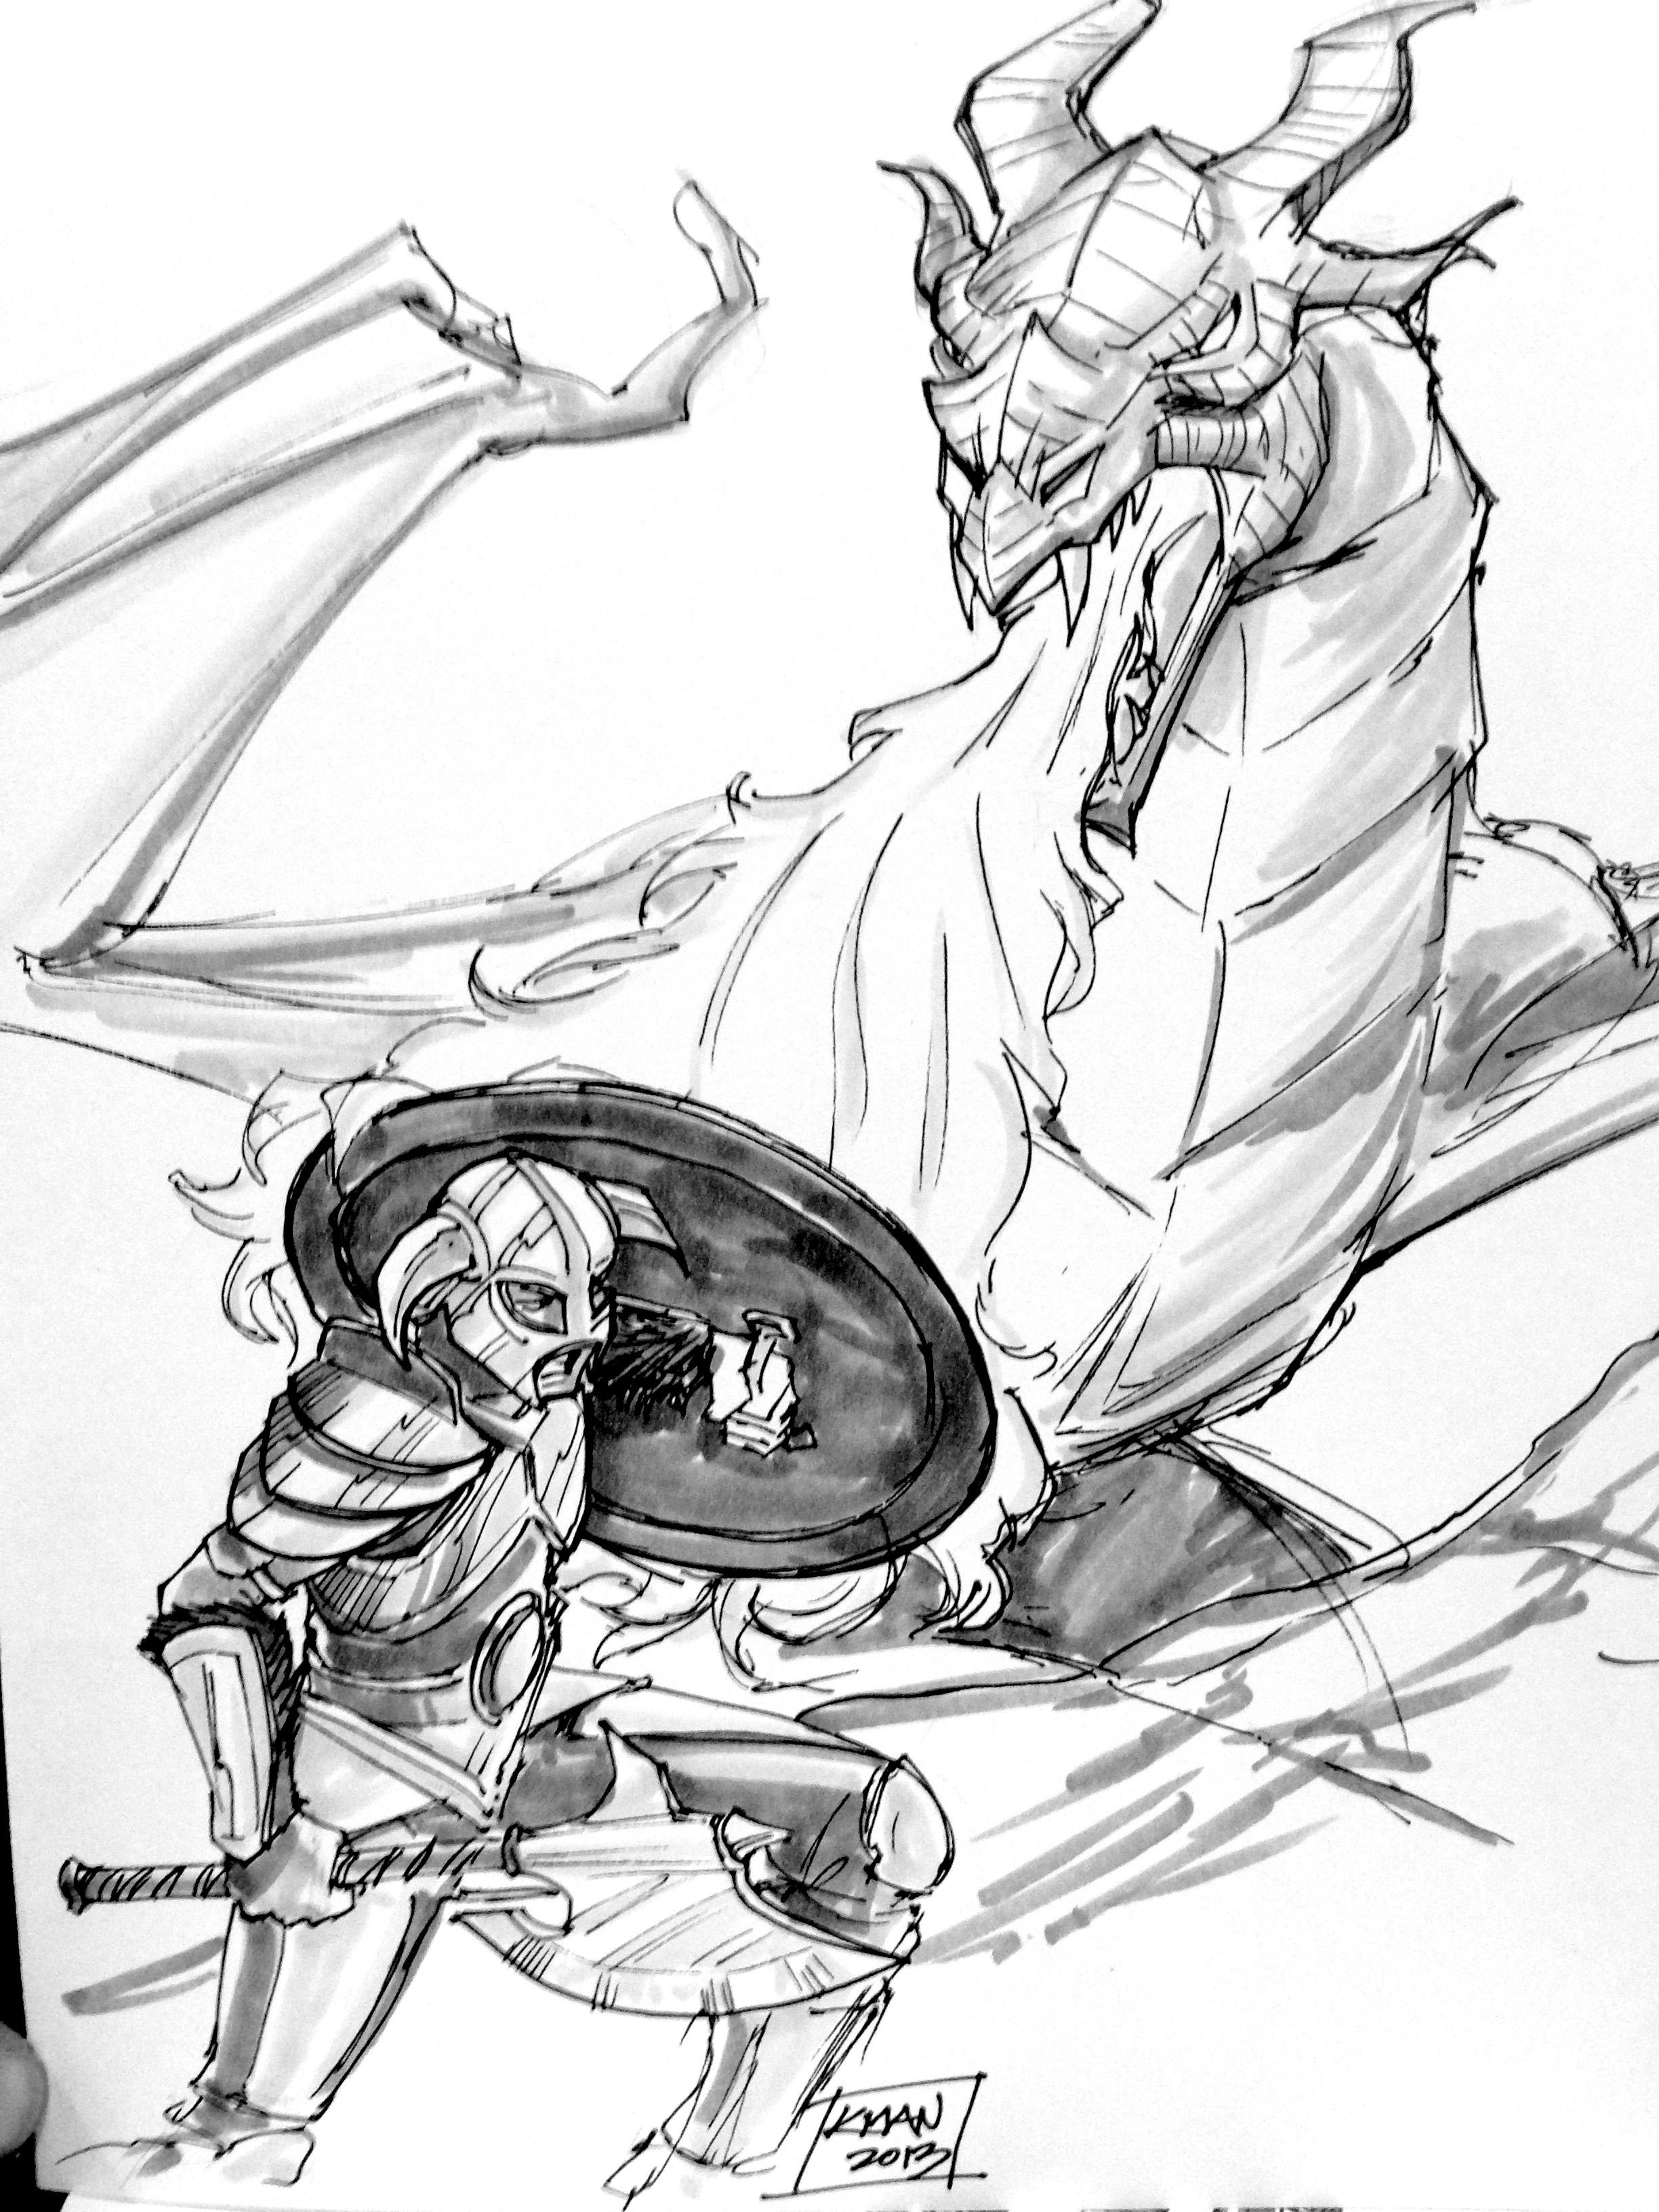 skyrim dragon fighting by kieronogorman on deviantart